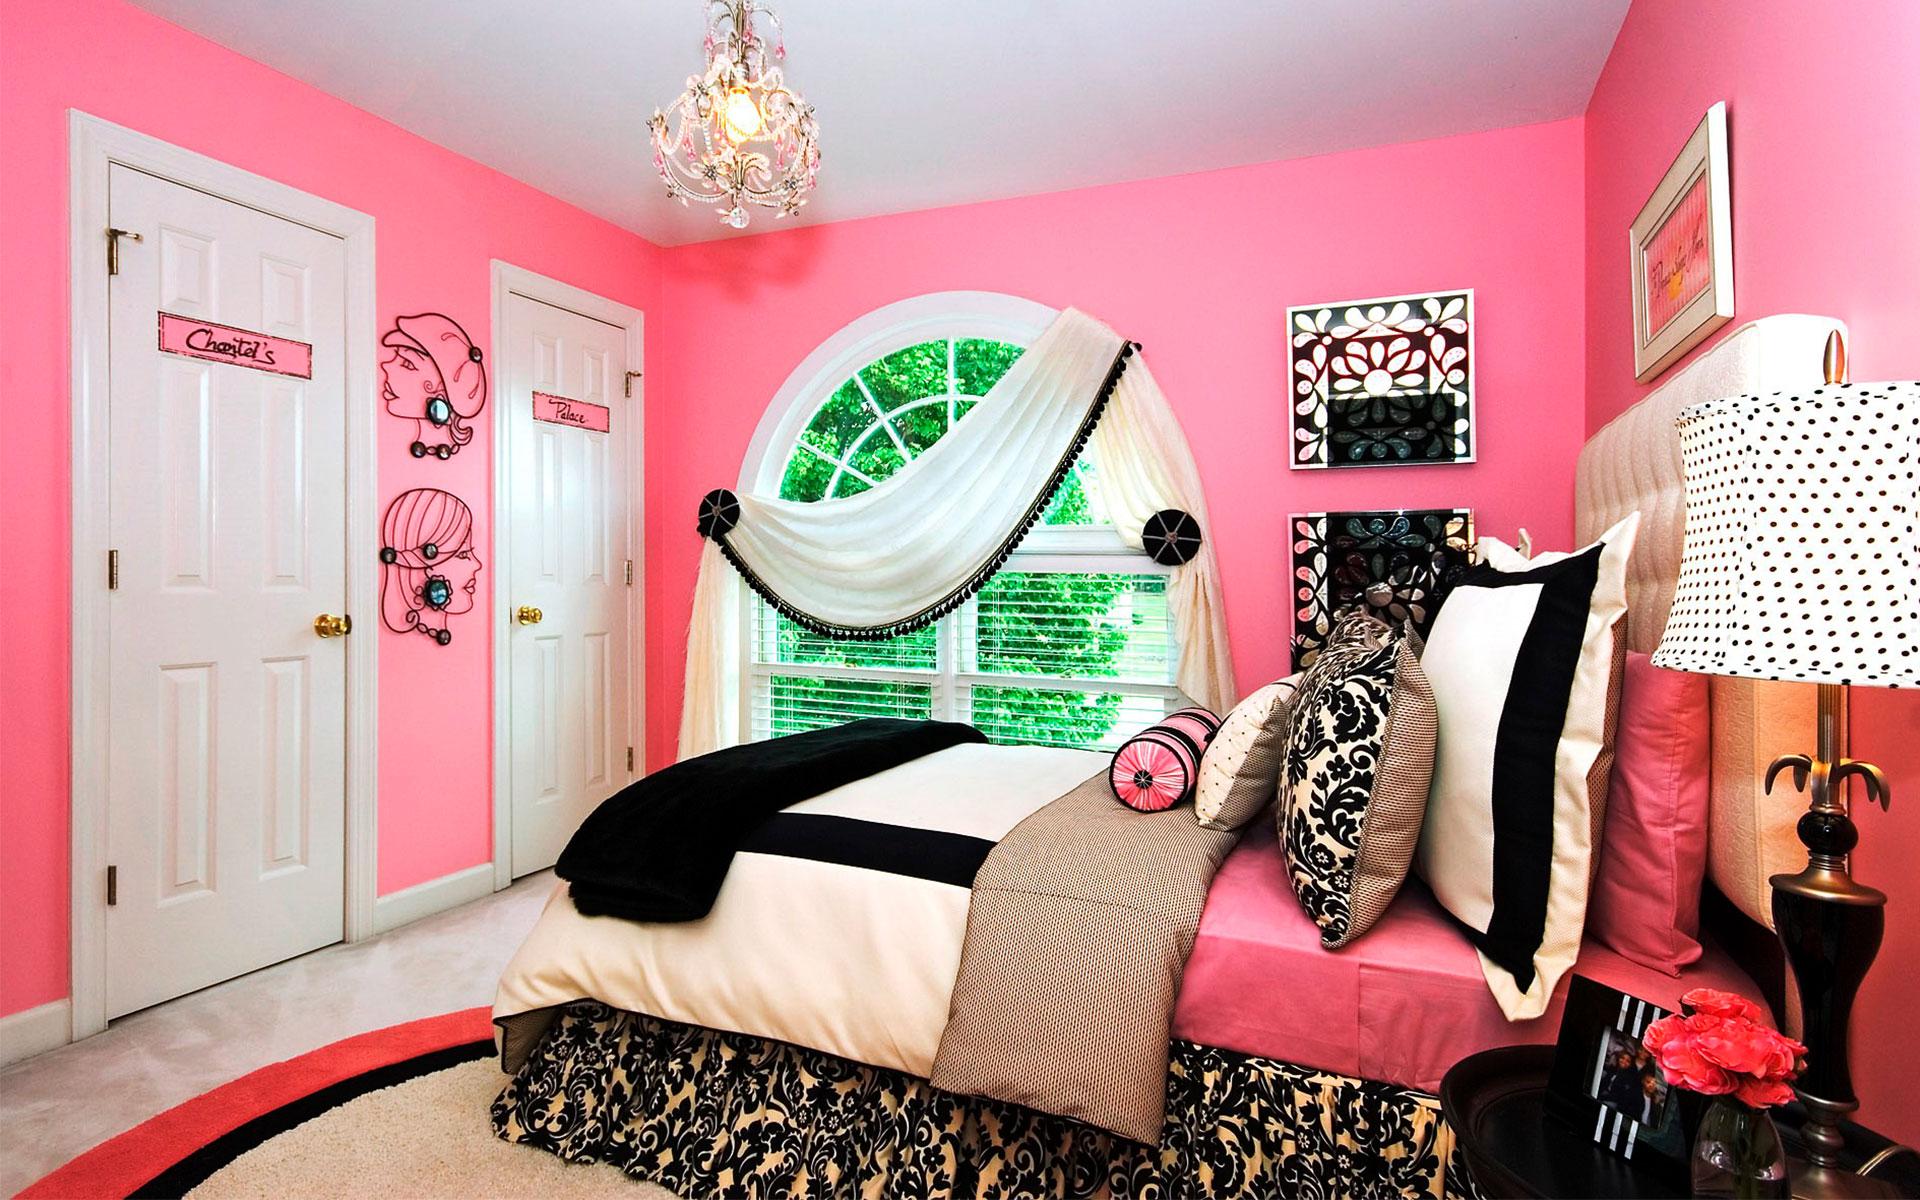 top 10 hottest pink room design ideas for 2017